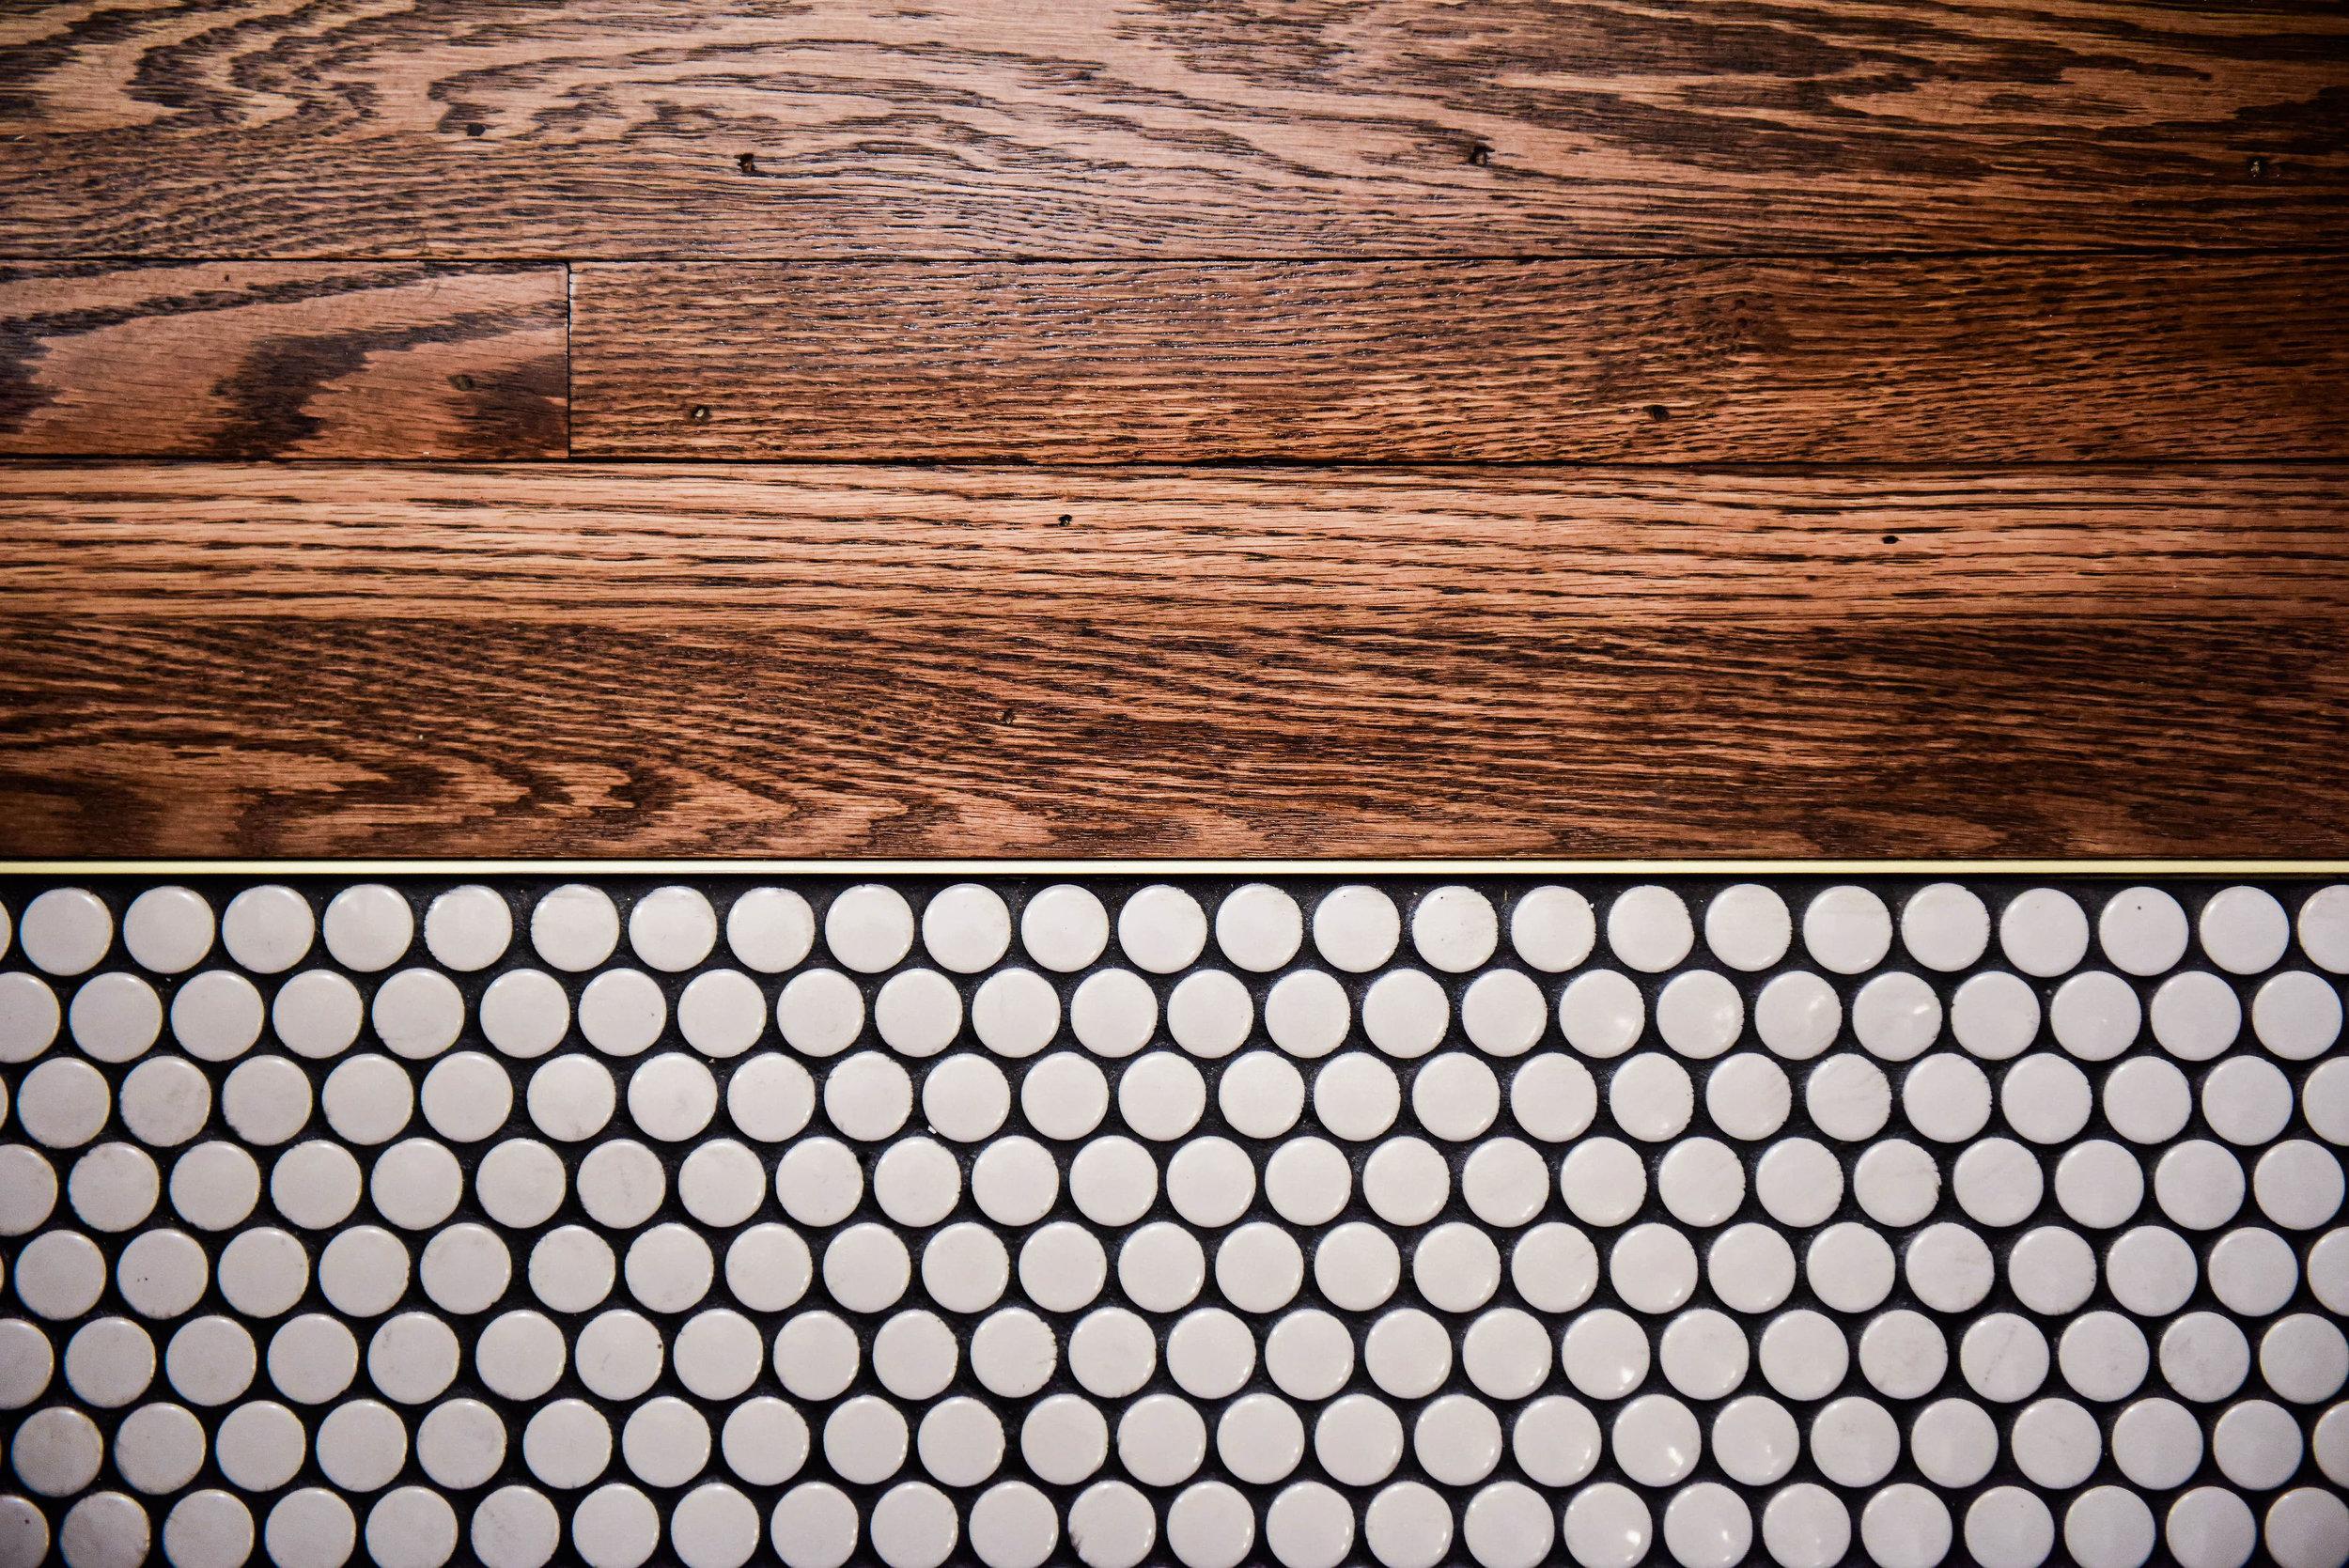 flooring transition wood to tile.jpg